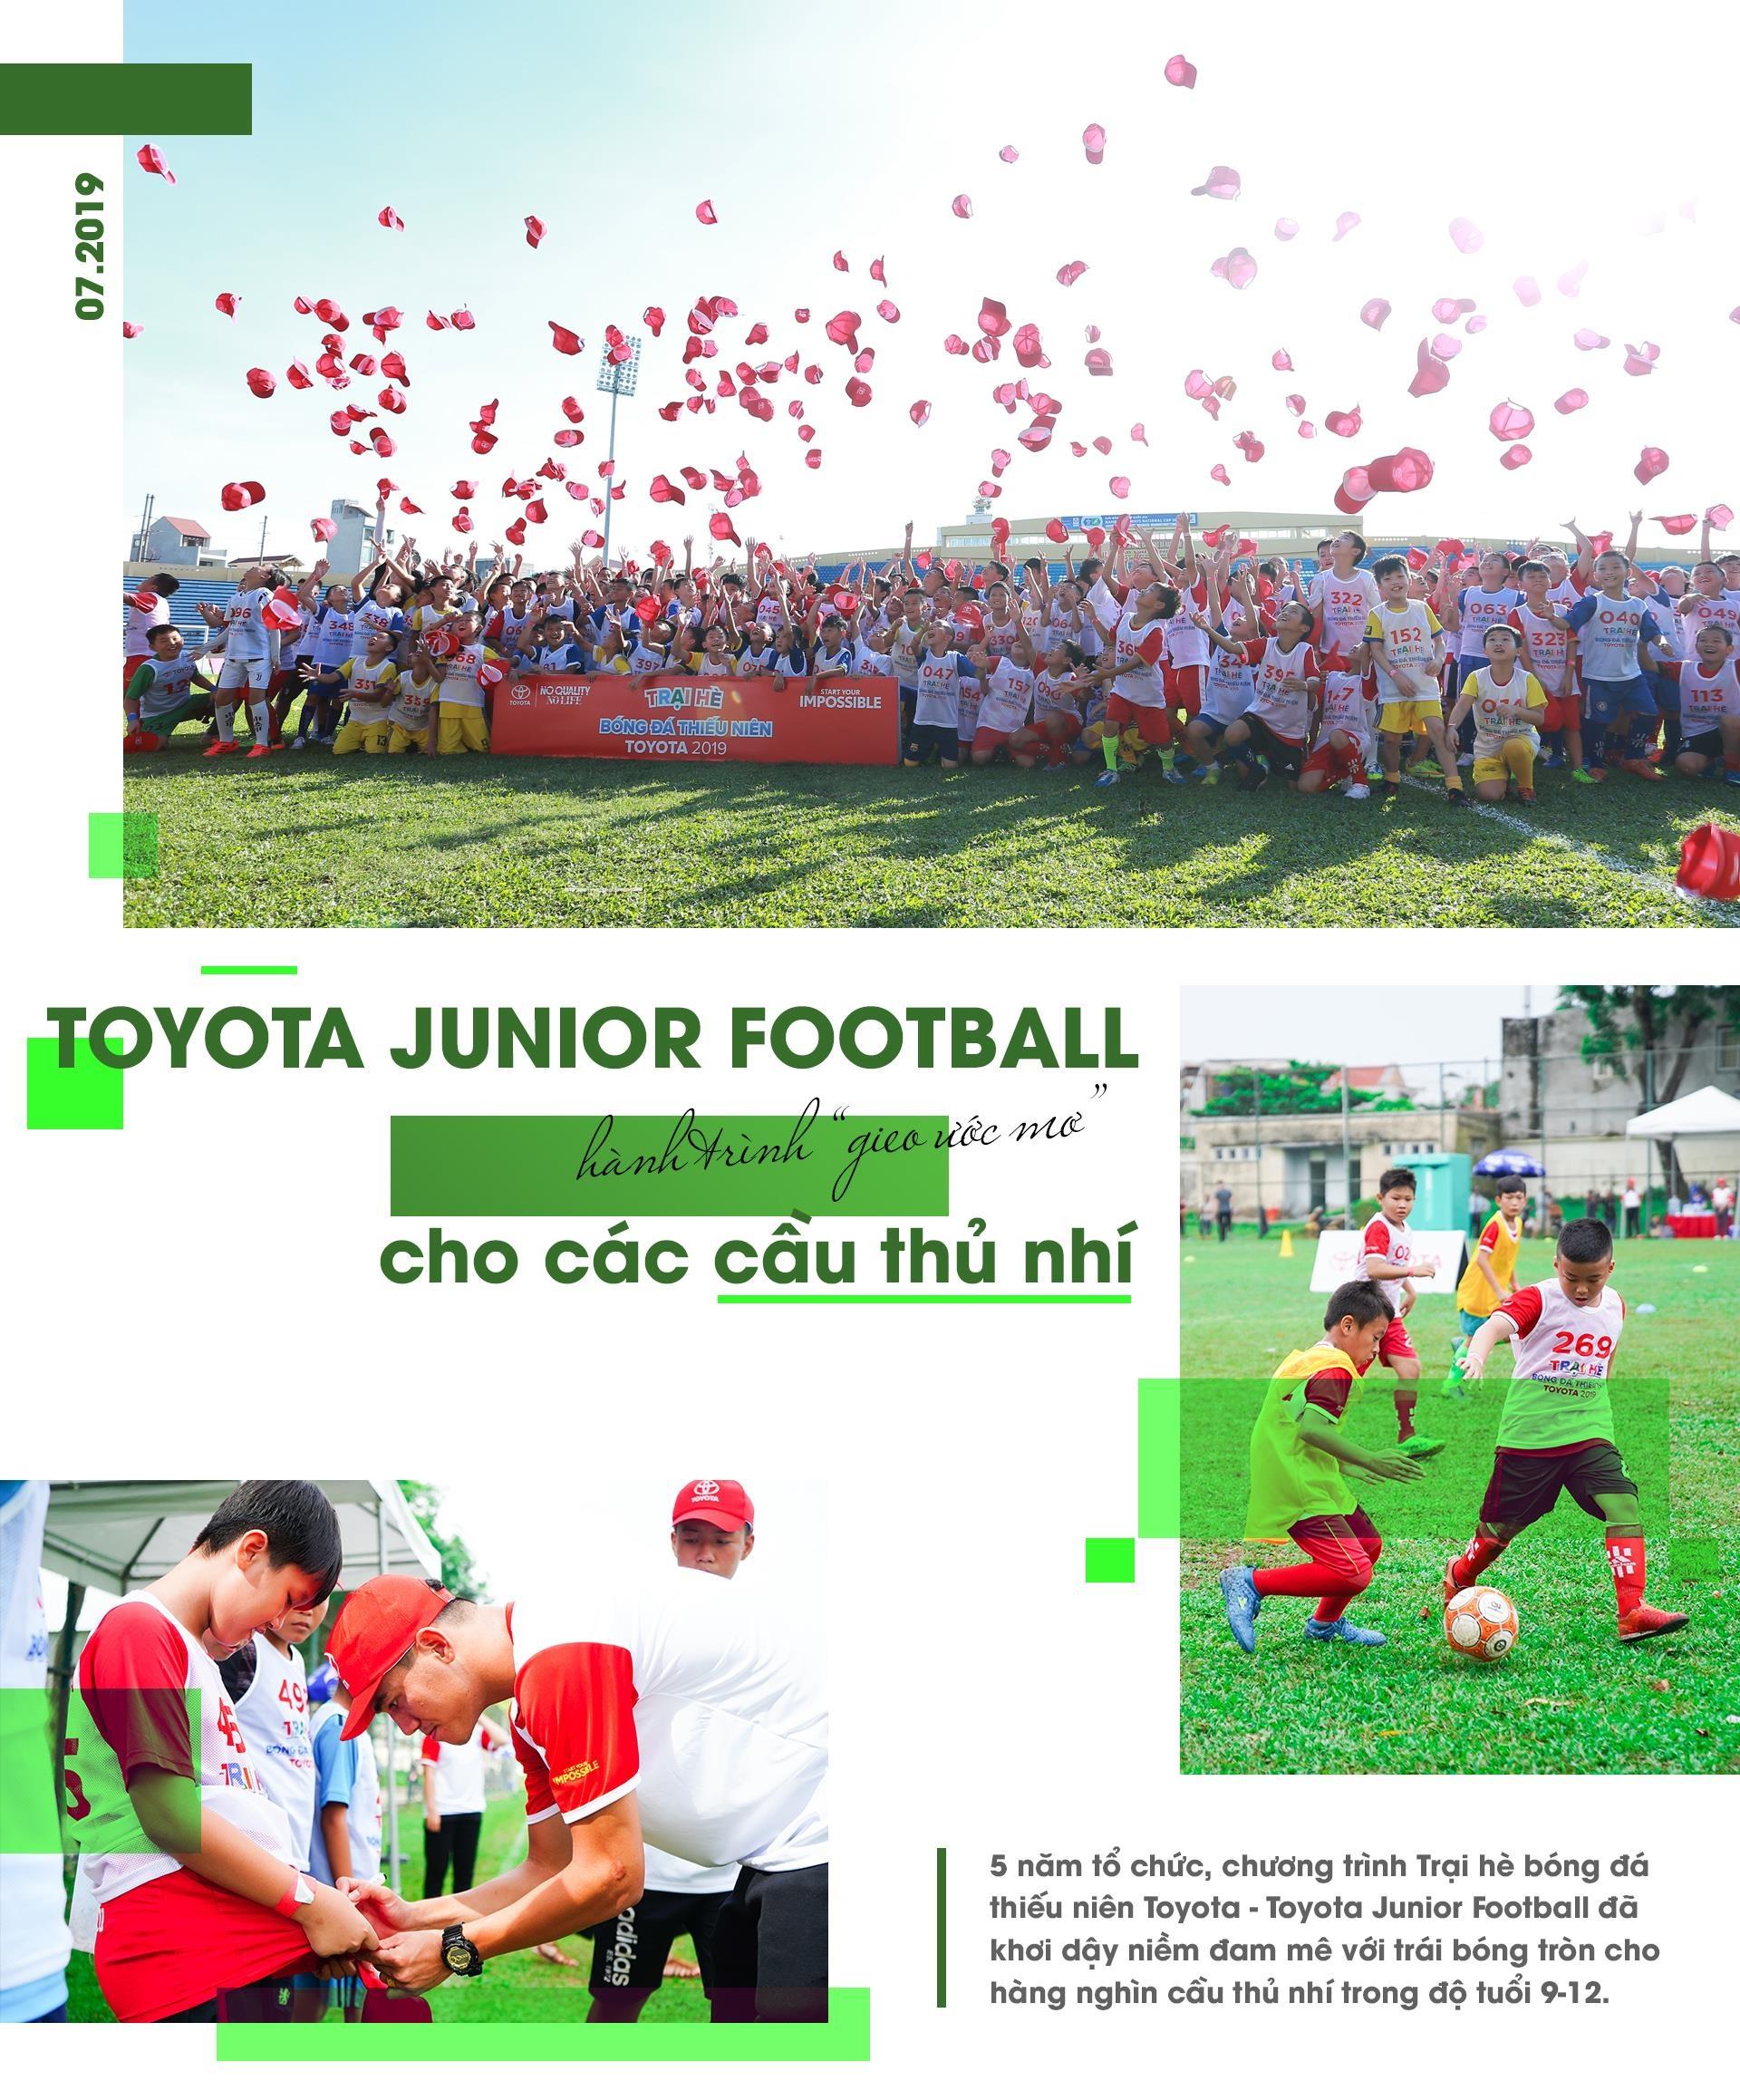 Toyota Junior Football - hanh trinh 'gieo uoc mo' cho cac cau thu nhi hinh anh 2